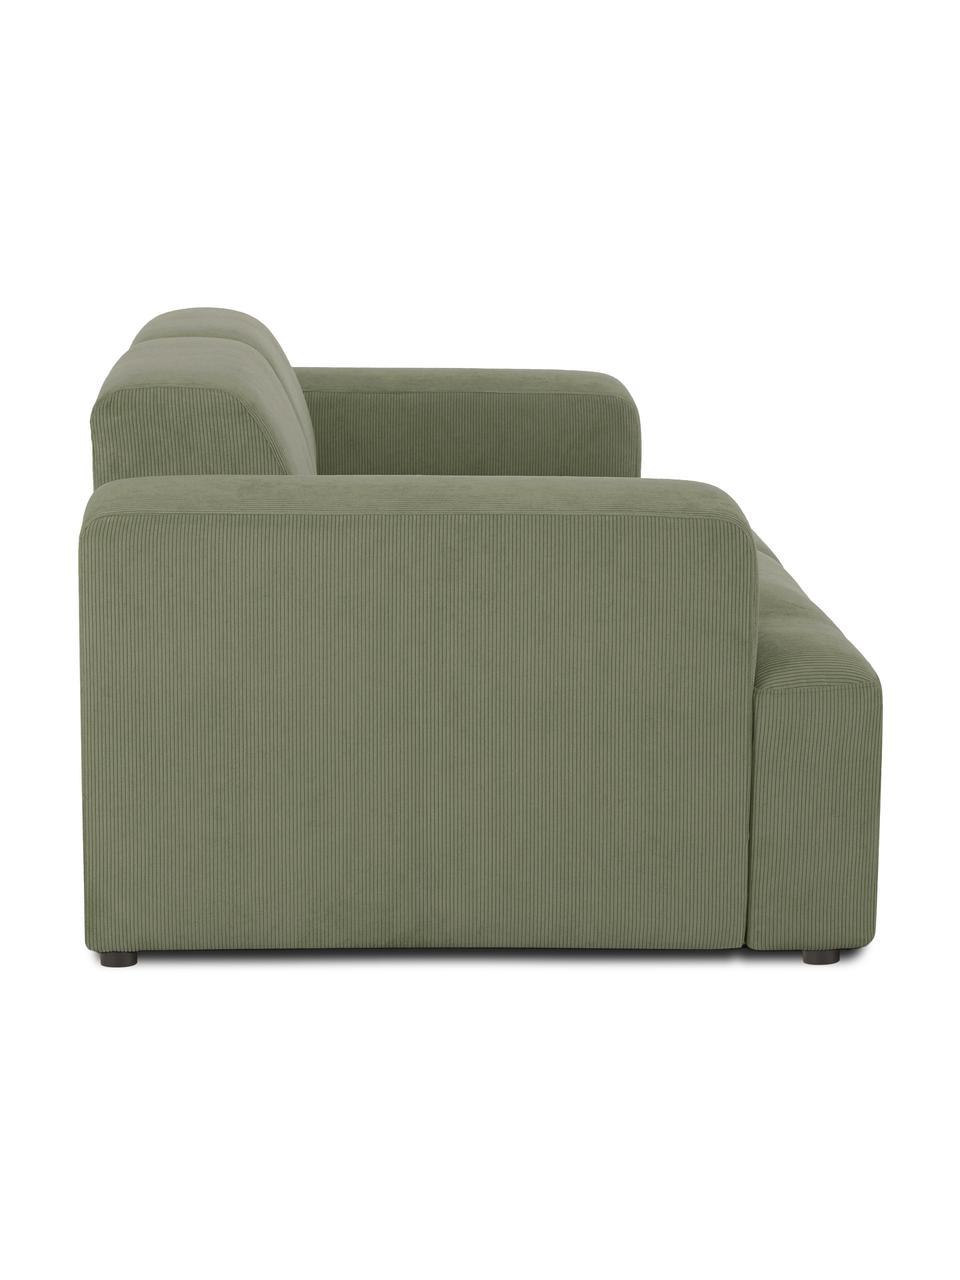 Ribfluwelen bank Melva (2-zits) in groen, Bekleding: corduroy (92% polyester, , Frame: massief grenenhout, FSC-g, Poten: kunststof, Corduroy groen, 198 x 101 cm